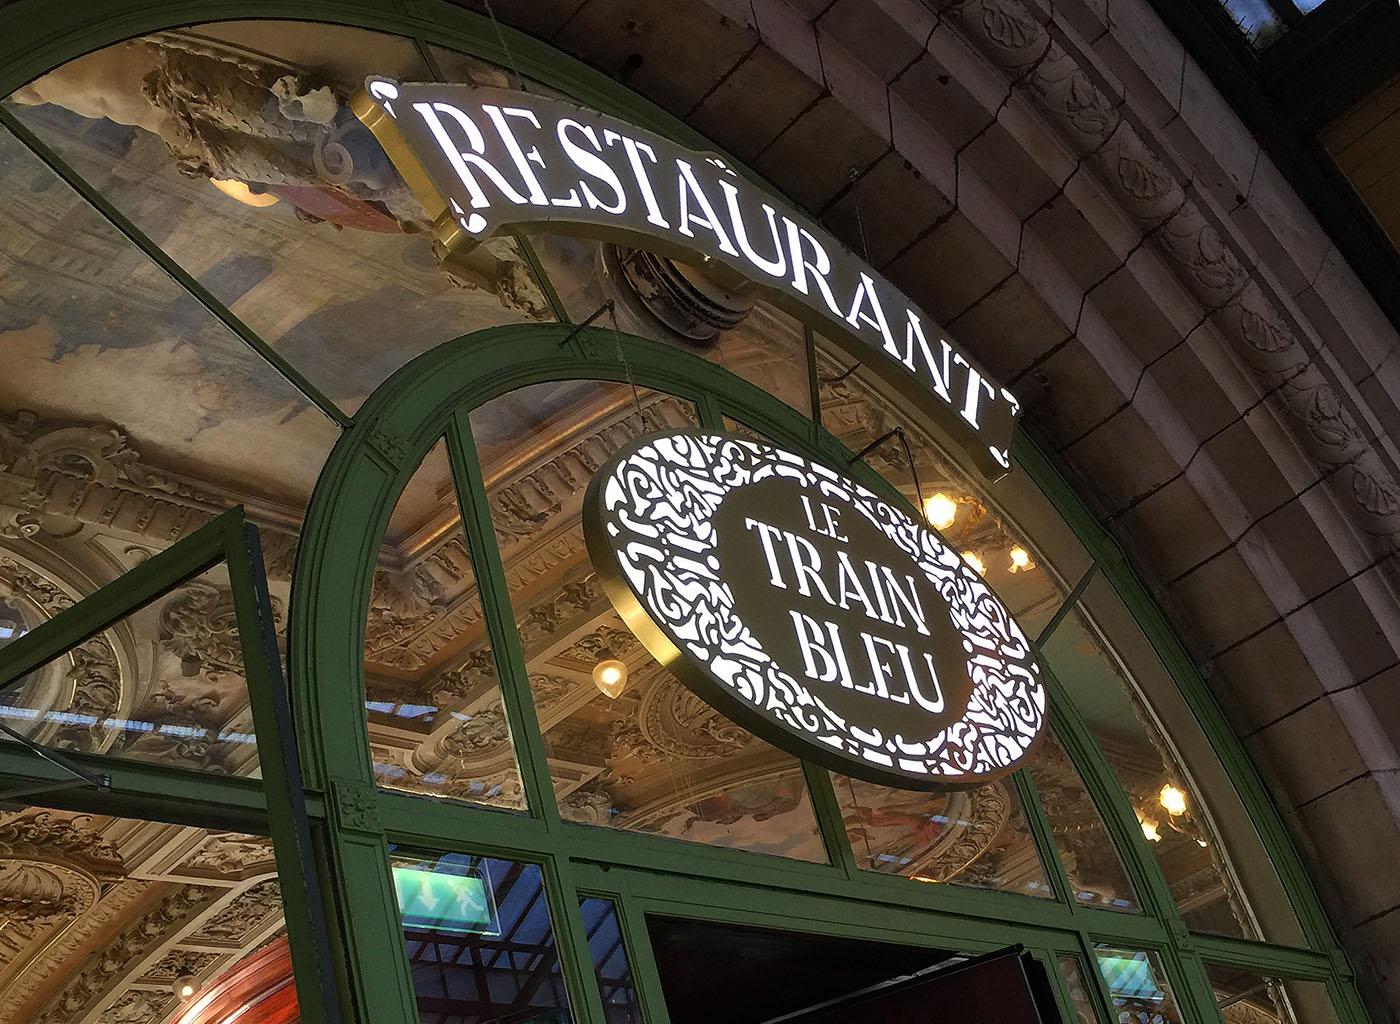 The historic Le Train Bleu in in the Gare du Lyon, Paris.